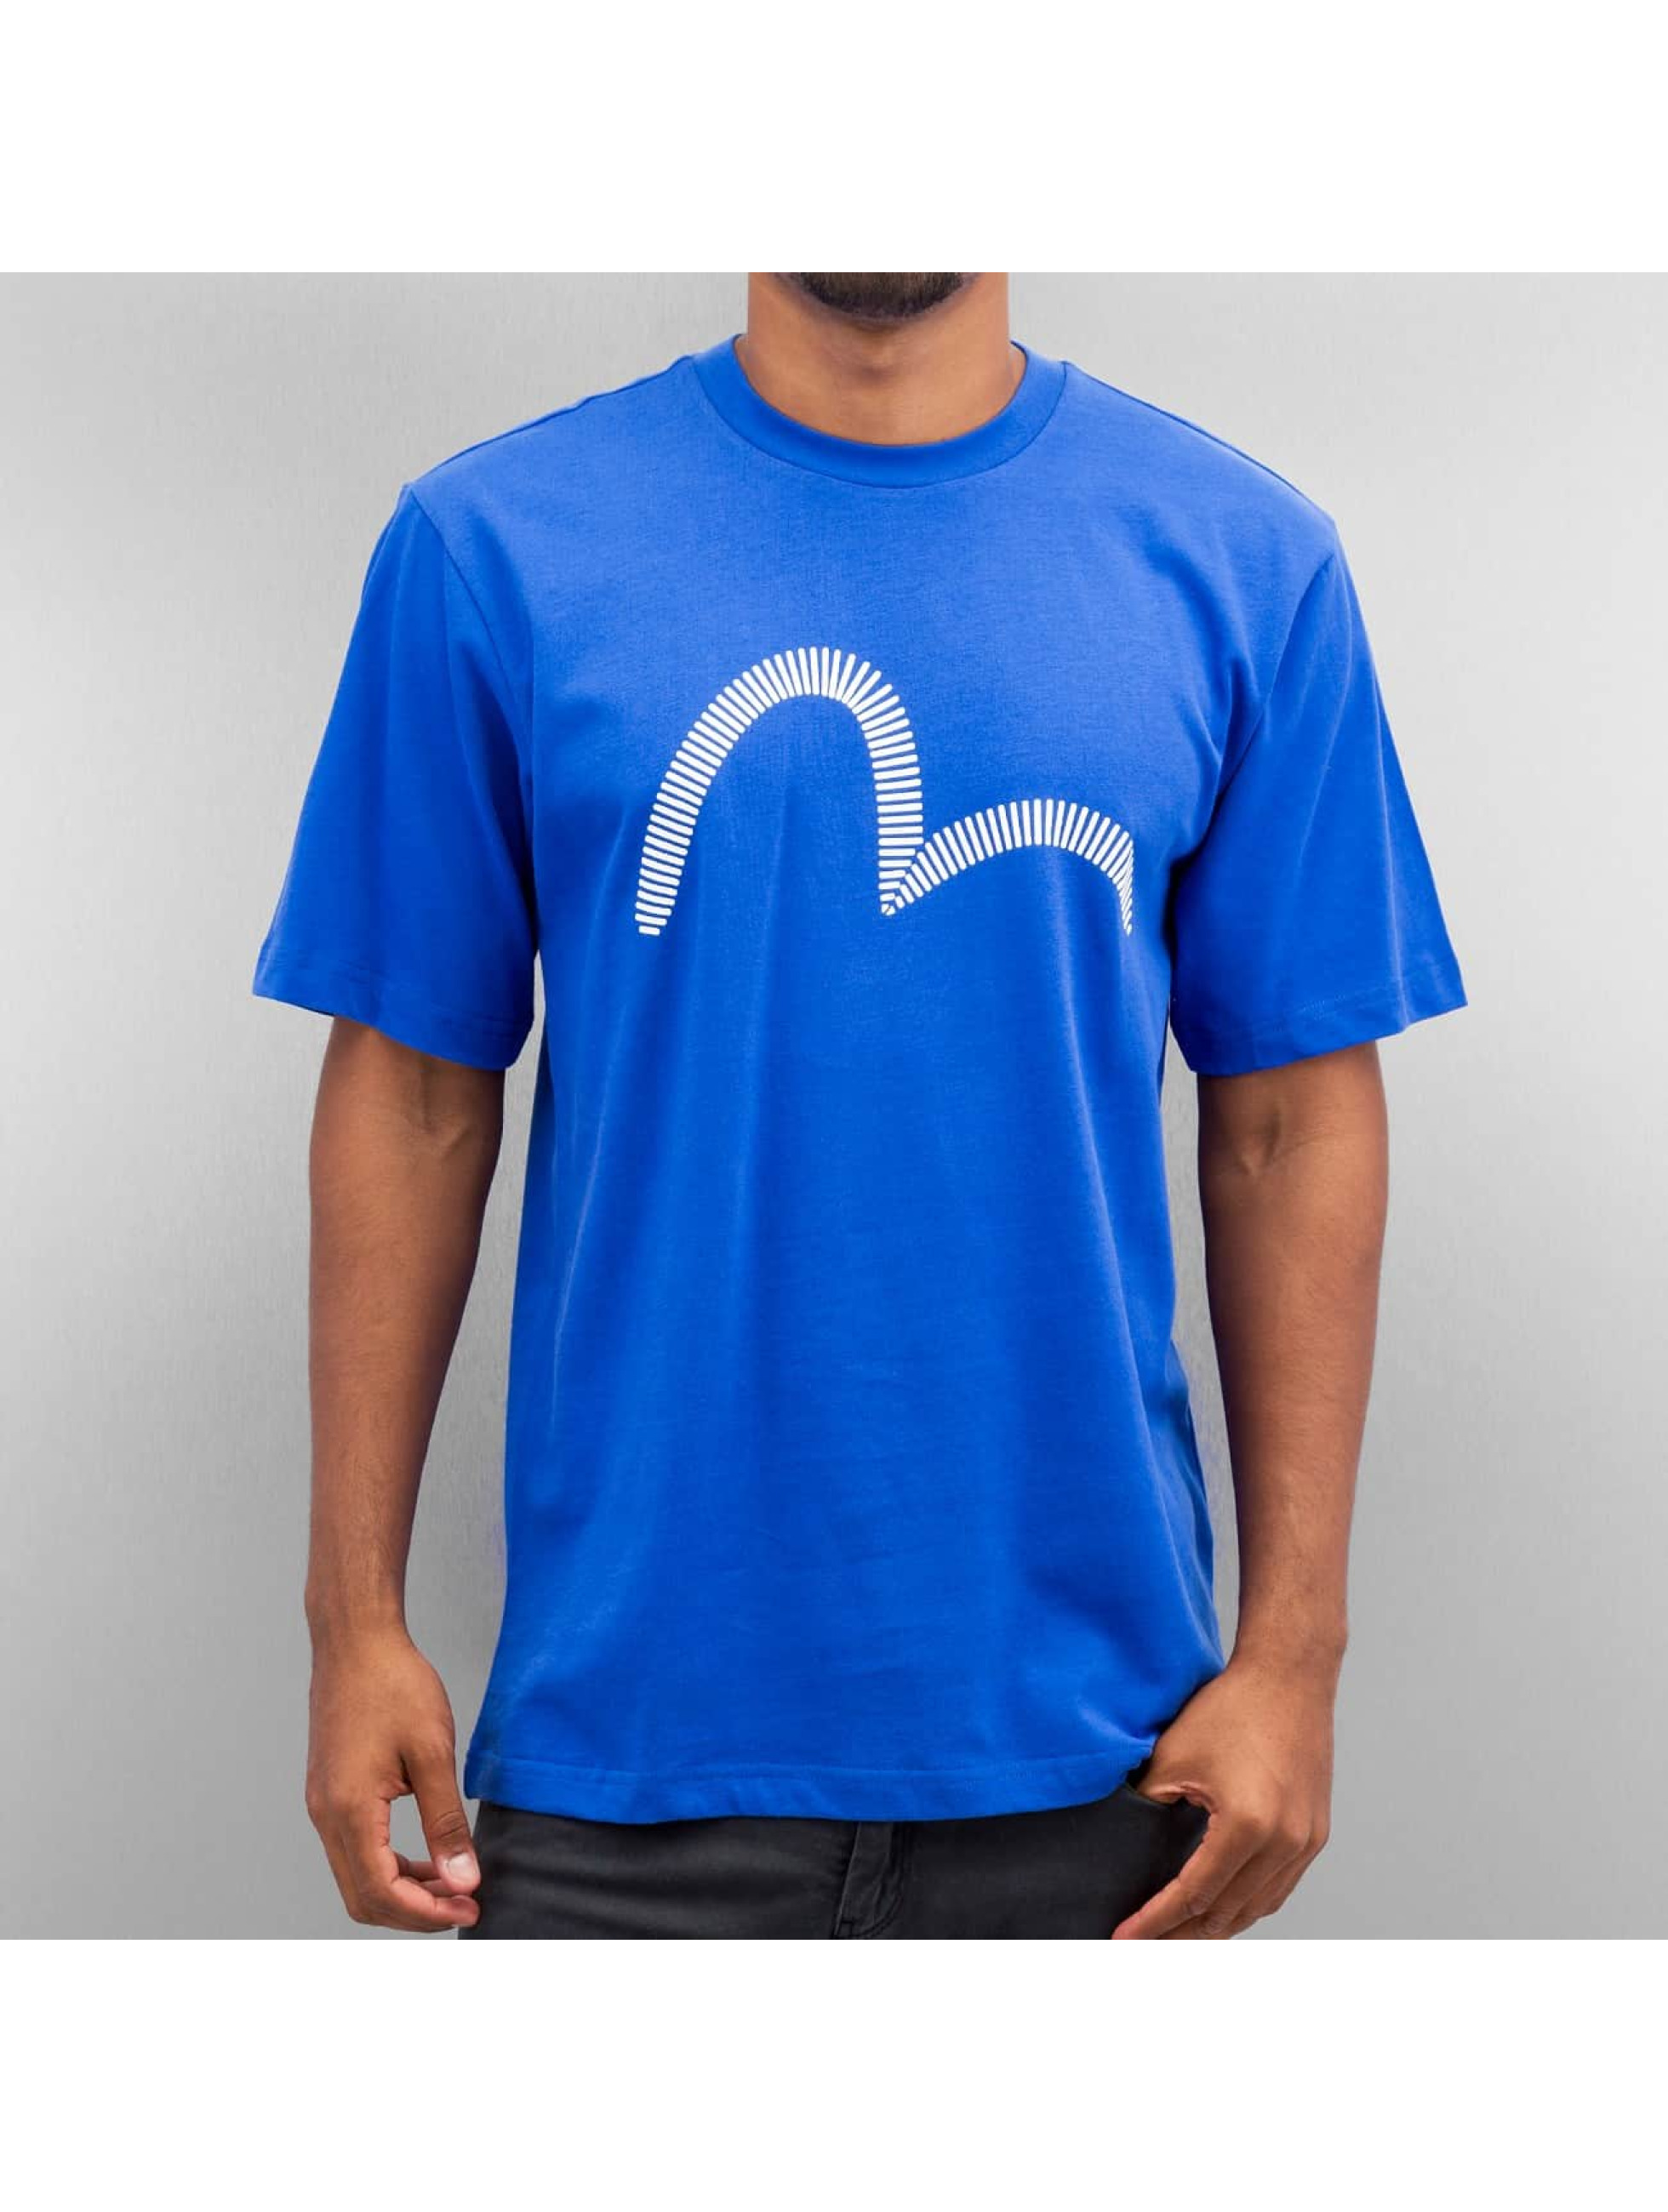 EVISU Männer T-Shirt Seagull in blau